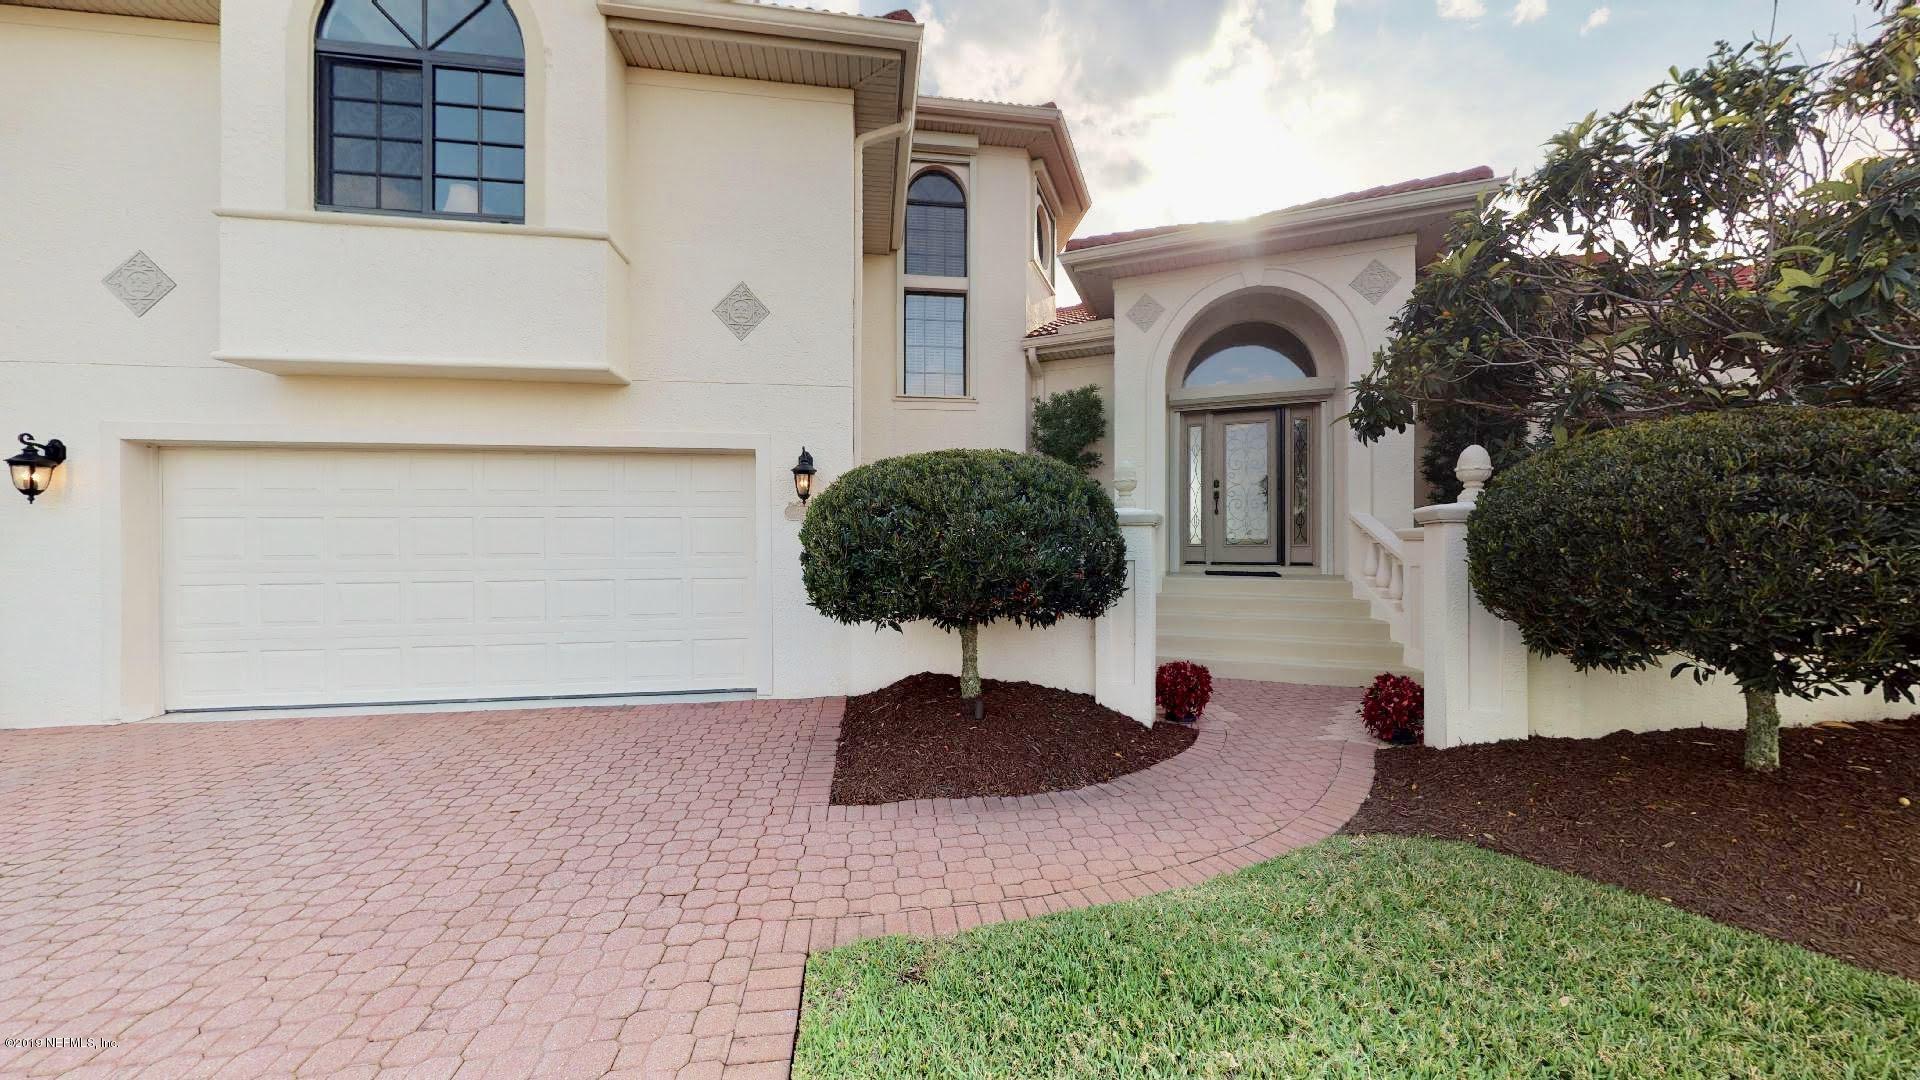 3403 LANDS END, ST AUGUSTINE, FLORIDA 32084, 3 Bedrooms Bedrooms, ,2 BathroomsBathrooms,Residential - single family,For sale,LANDS END,984238